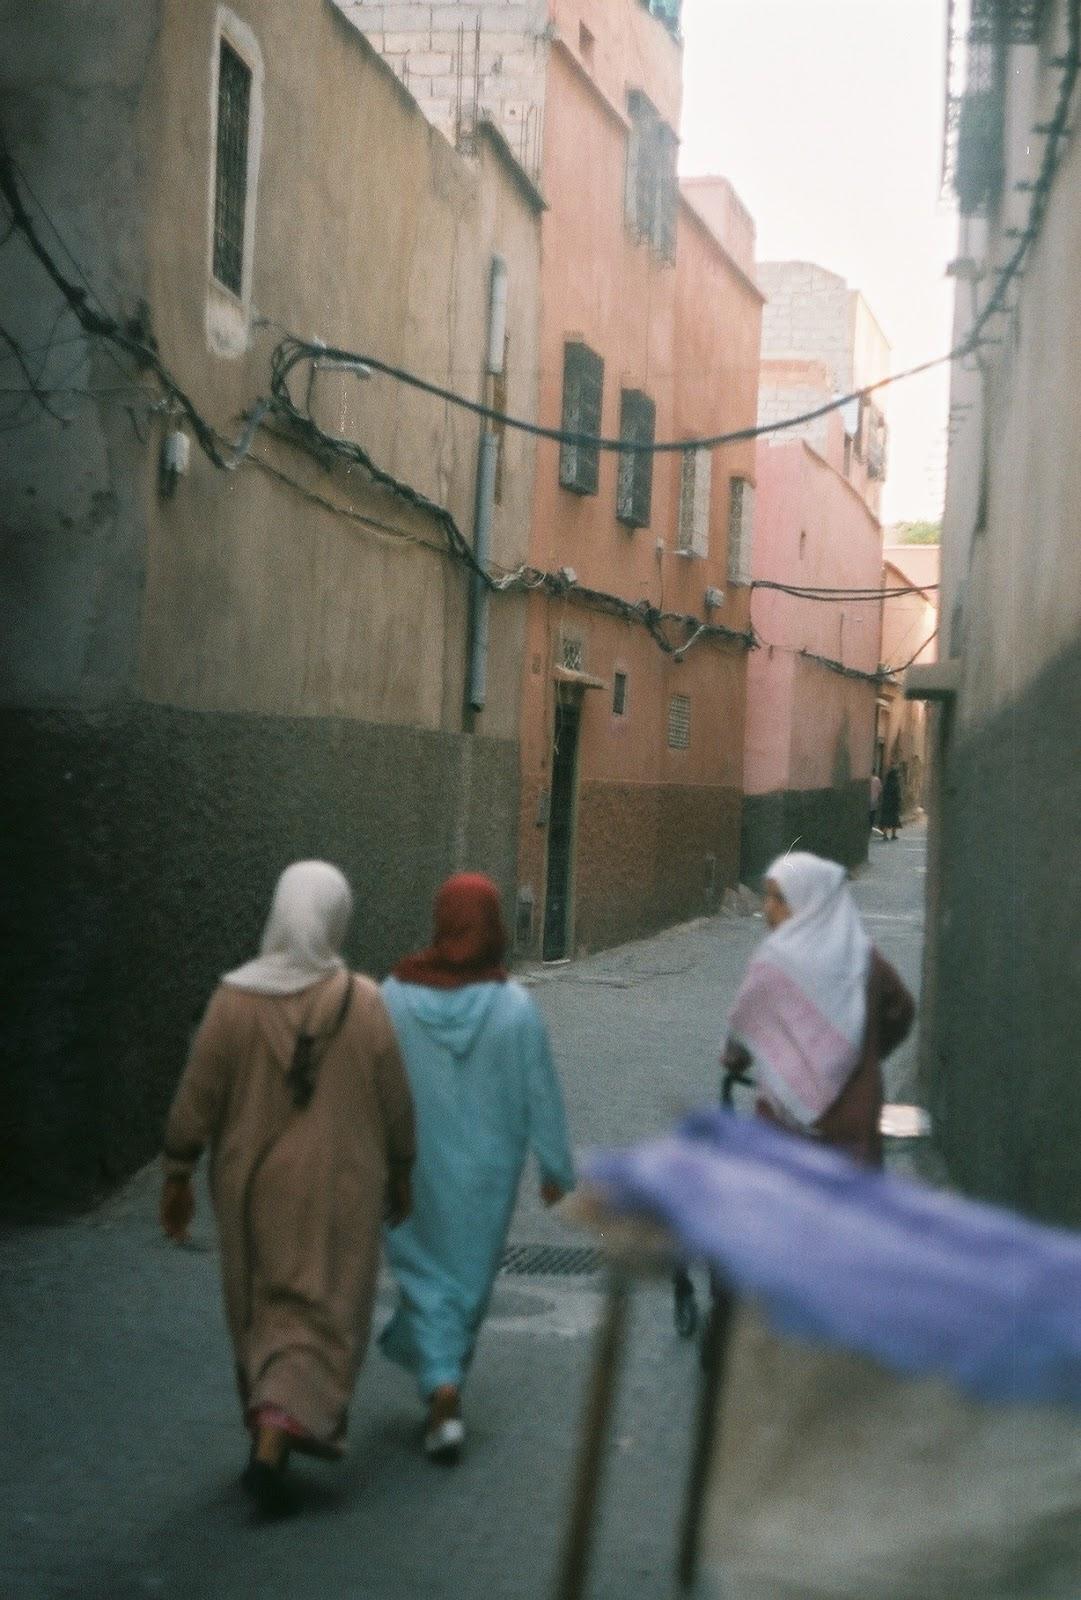 Karina so Marrakech Morocco travel diary vlog blogger session reveries